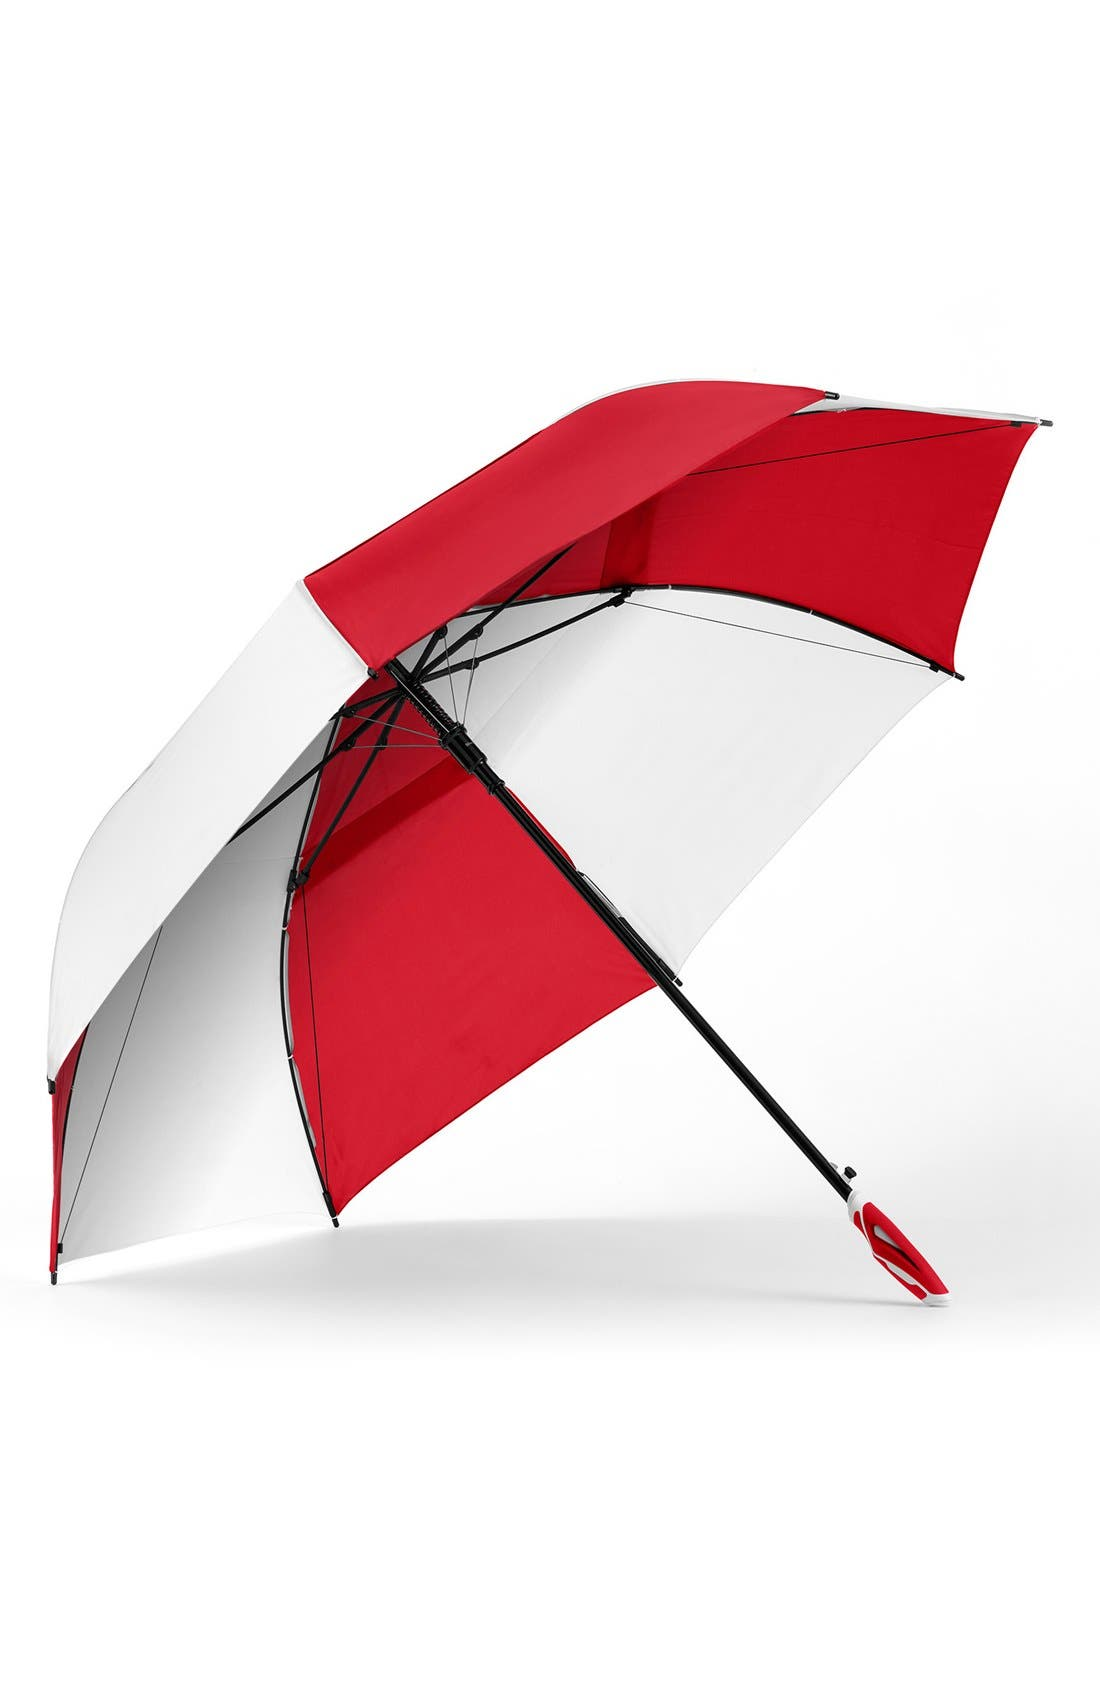 SHEDRAIN 'WindJammer<sup>®</sup>' Auto Open Golf Umbrella, Main, color, 621